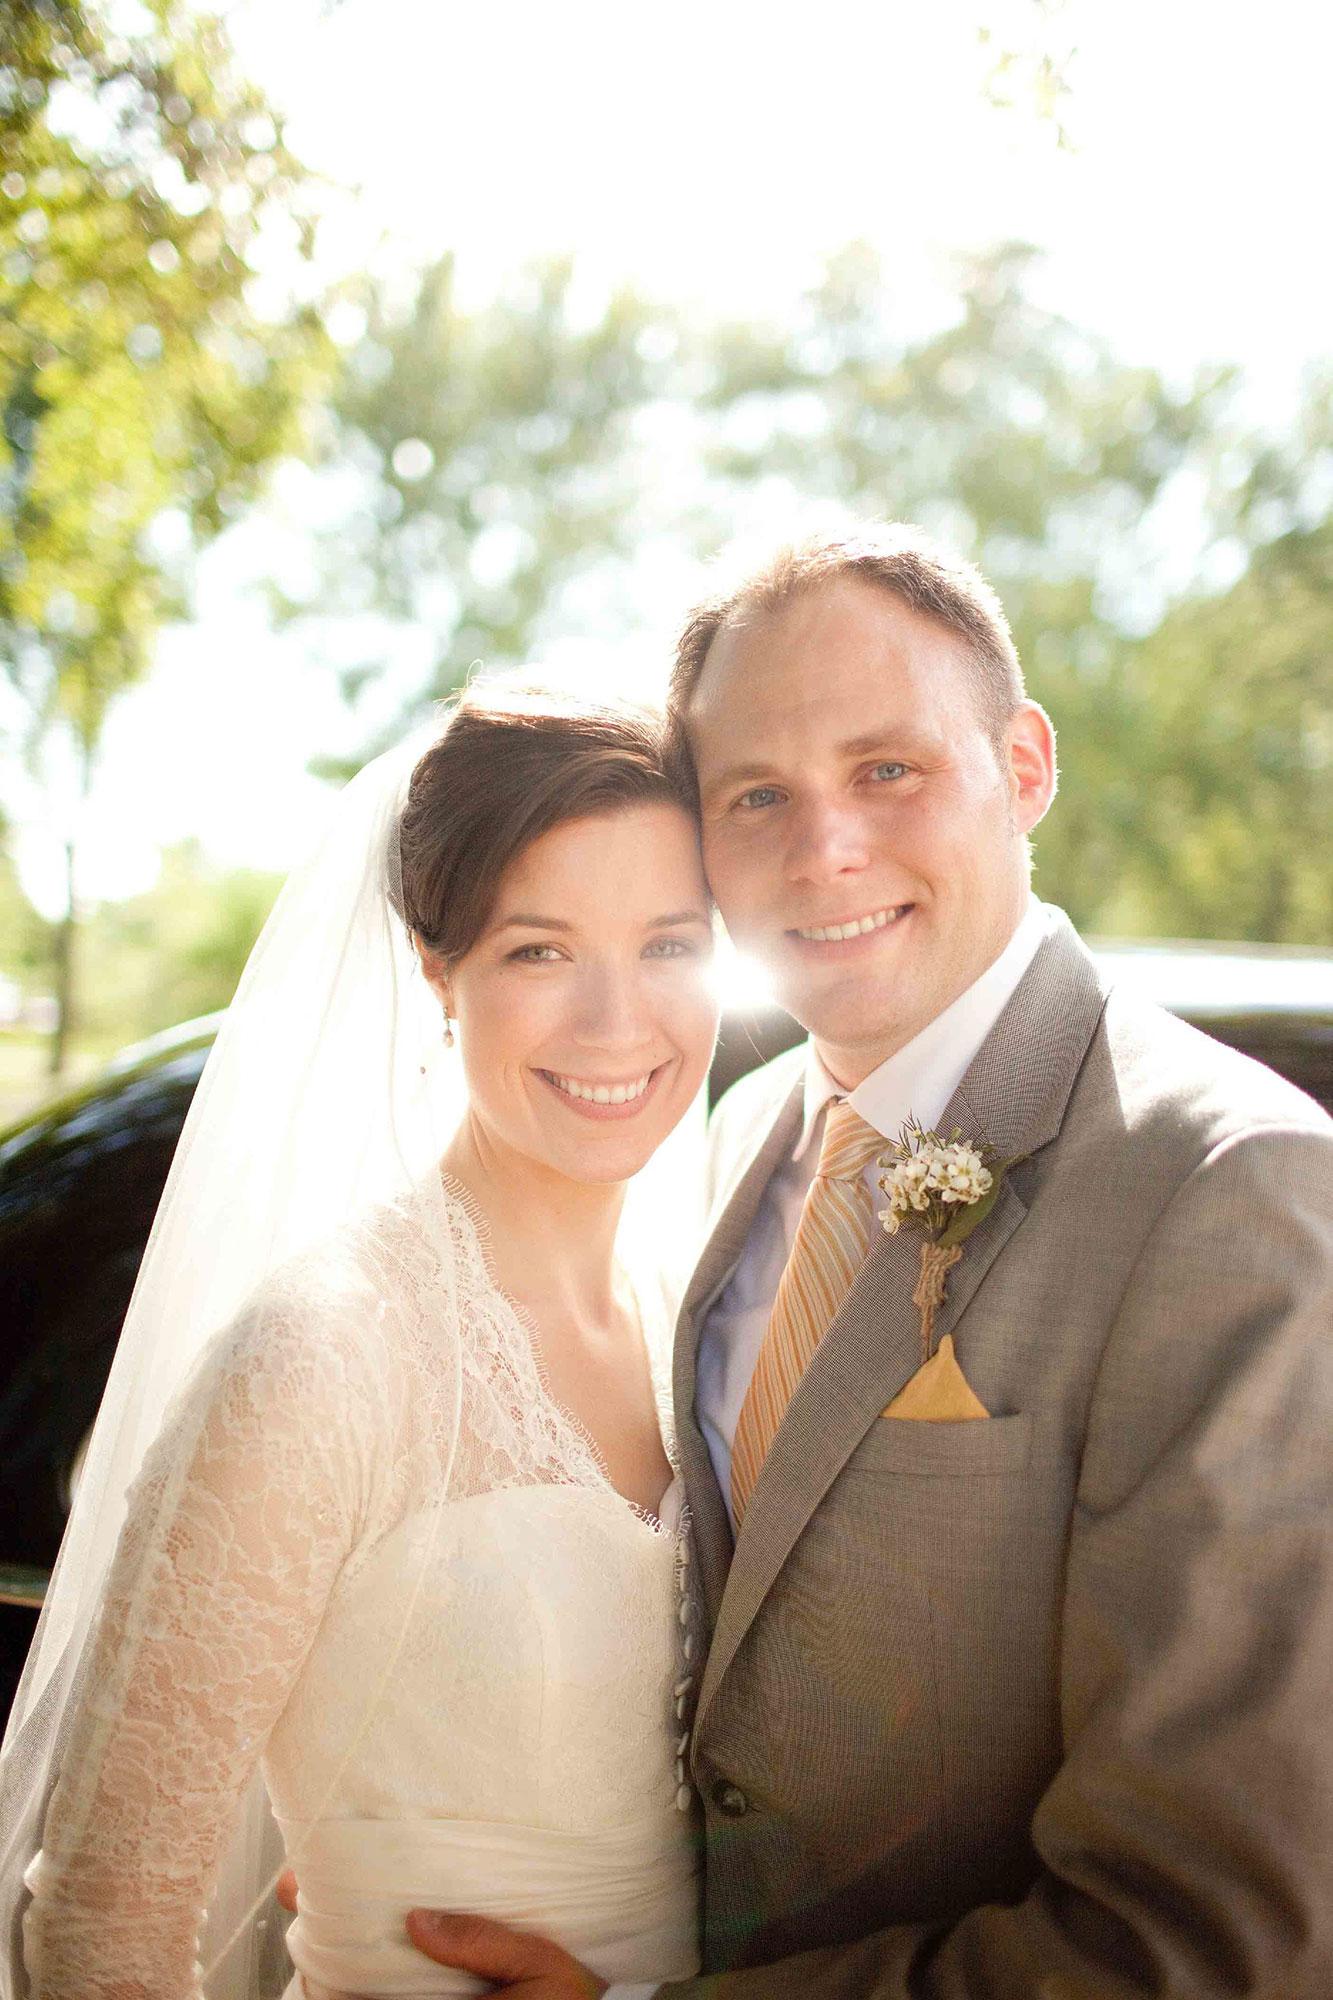 Amanda-Cowley-Willowbank-Vineyard-Bride-Photo-By-White-Photographie-014.jpg